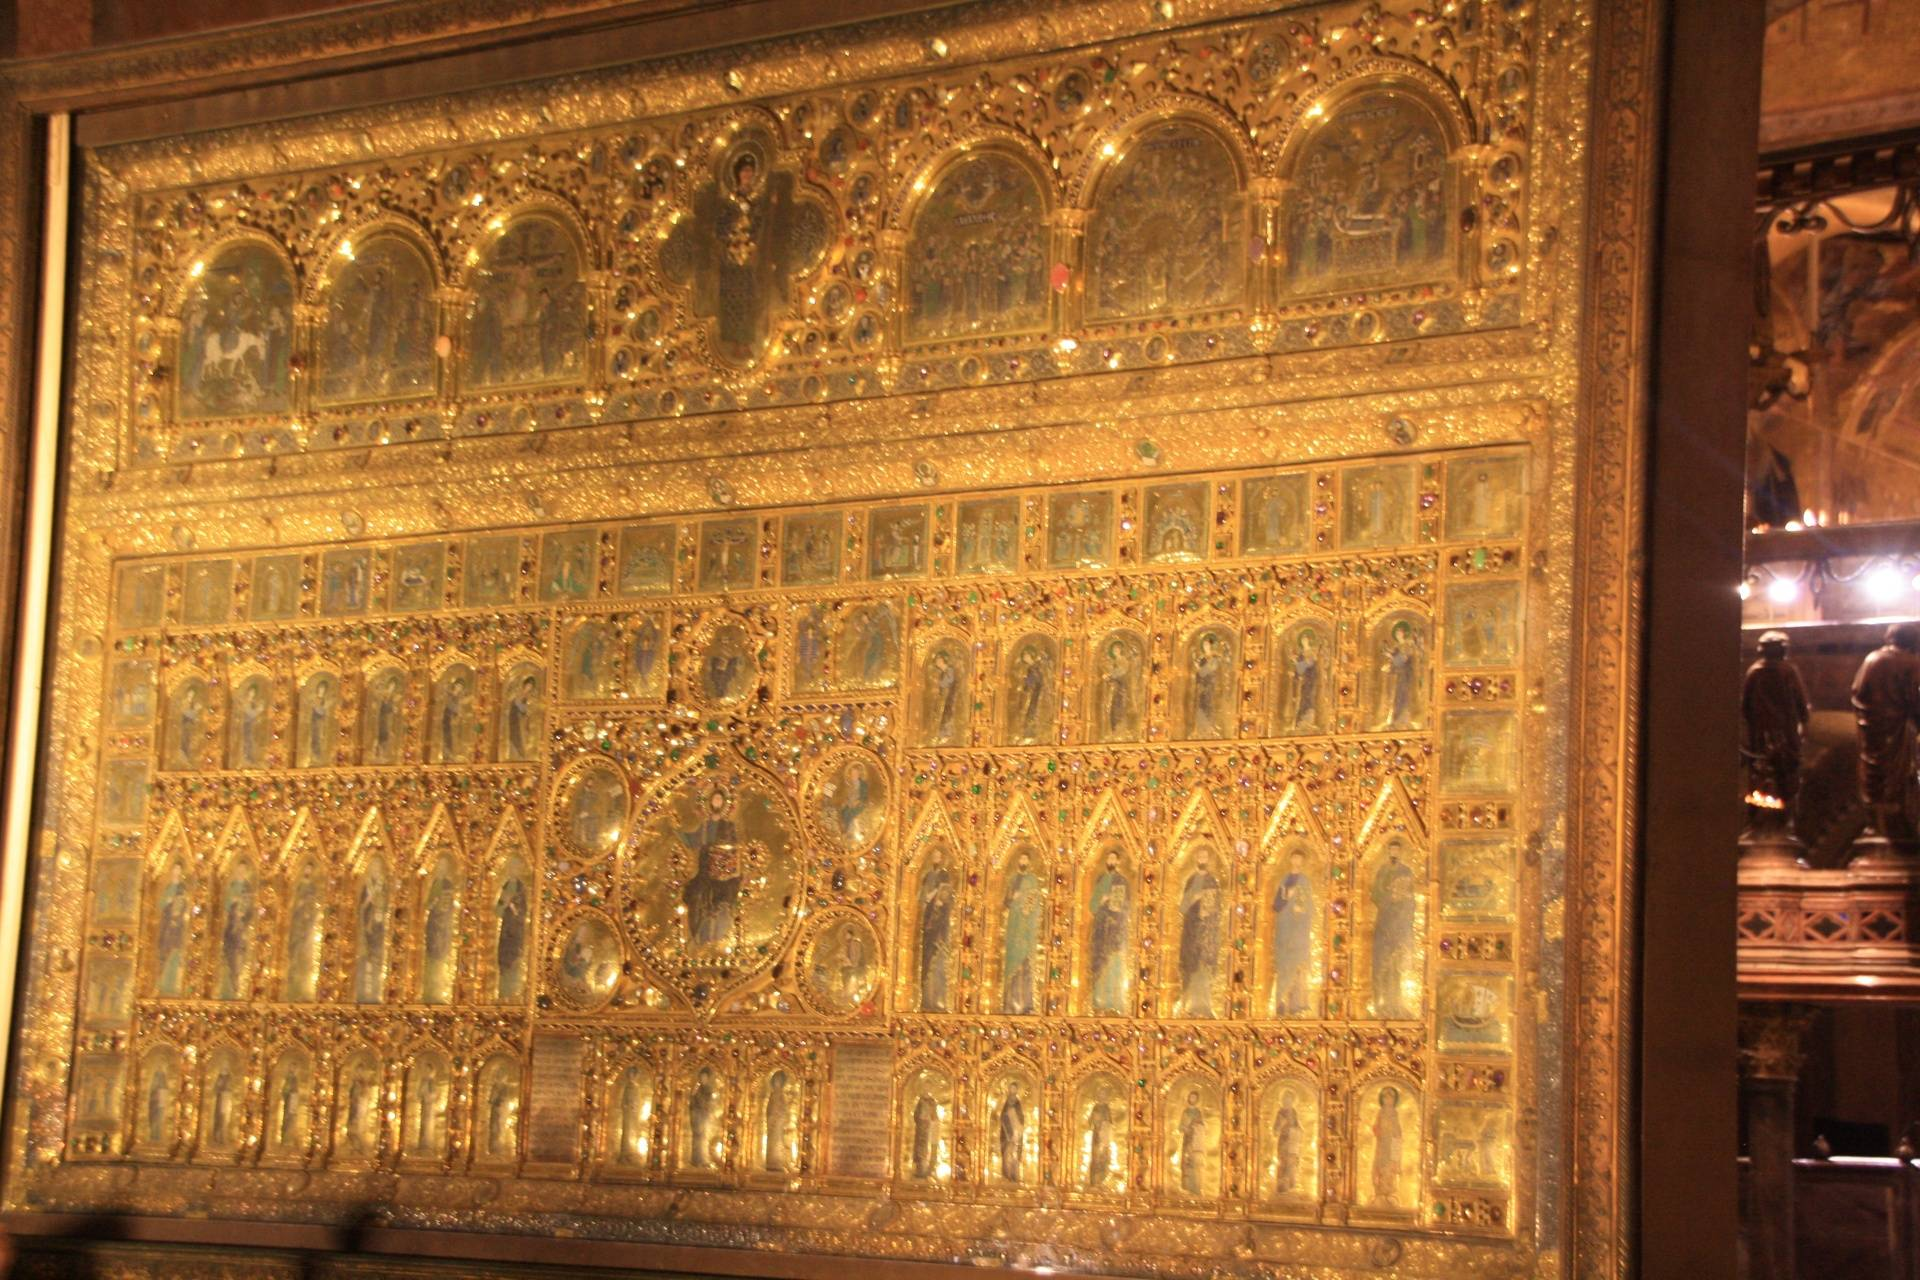 Gold alter at St. Mark's Basilica